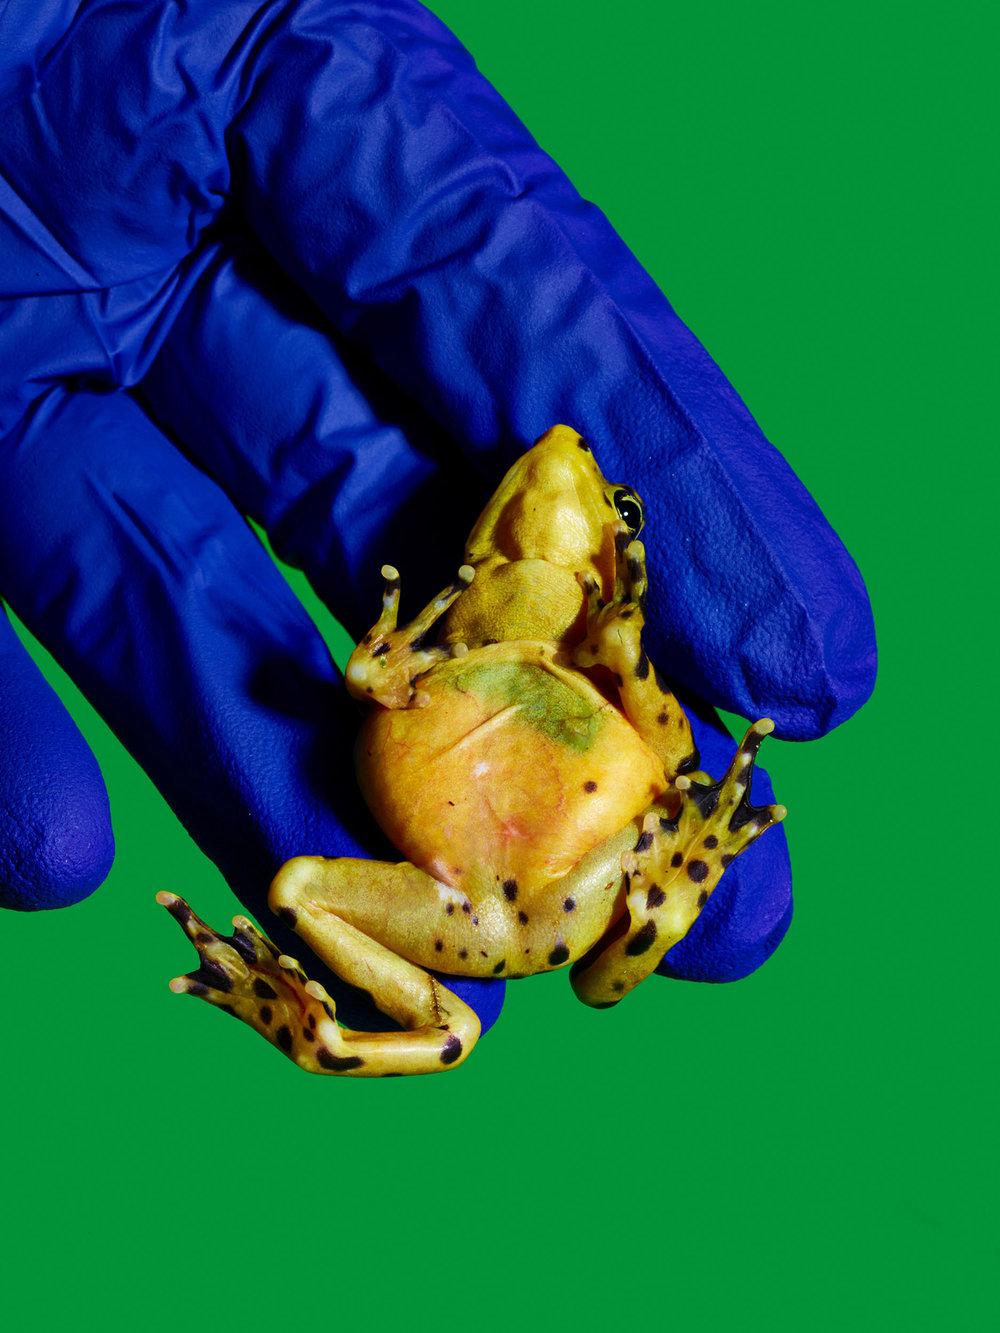 Pregnant Female Panamanian Golden Frog, Smithsonian National Zoo